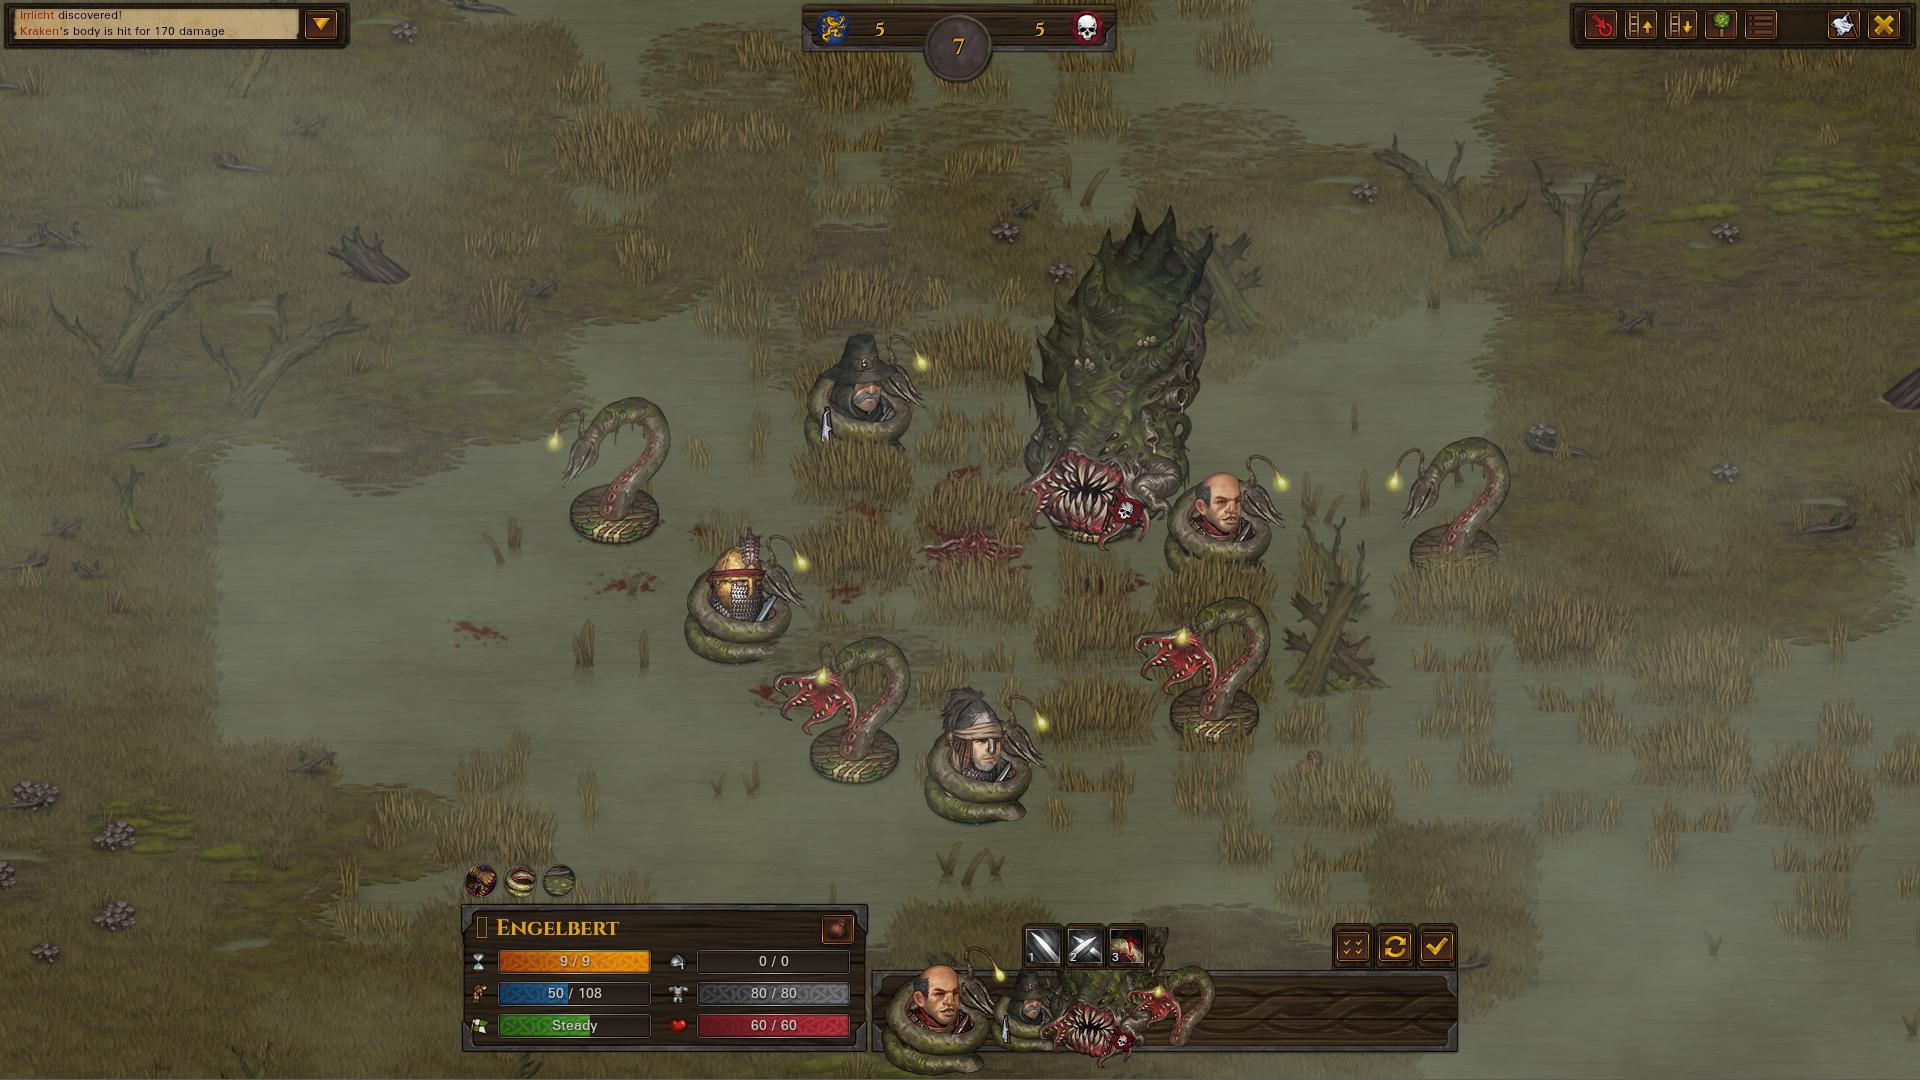 battle-brothers-pc-screenshot-02